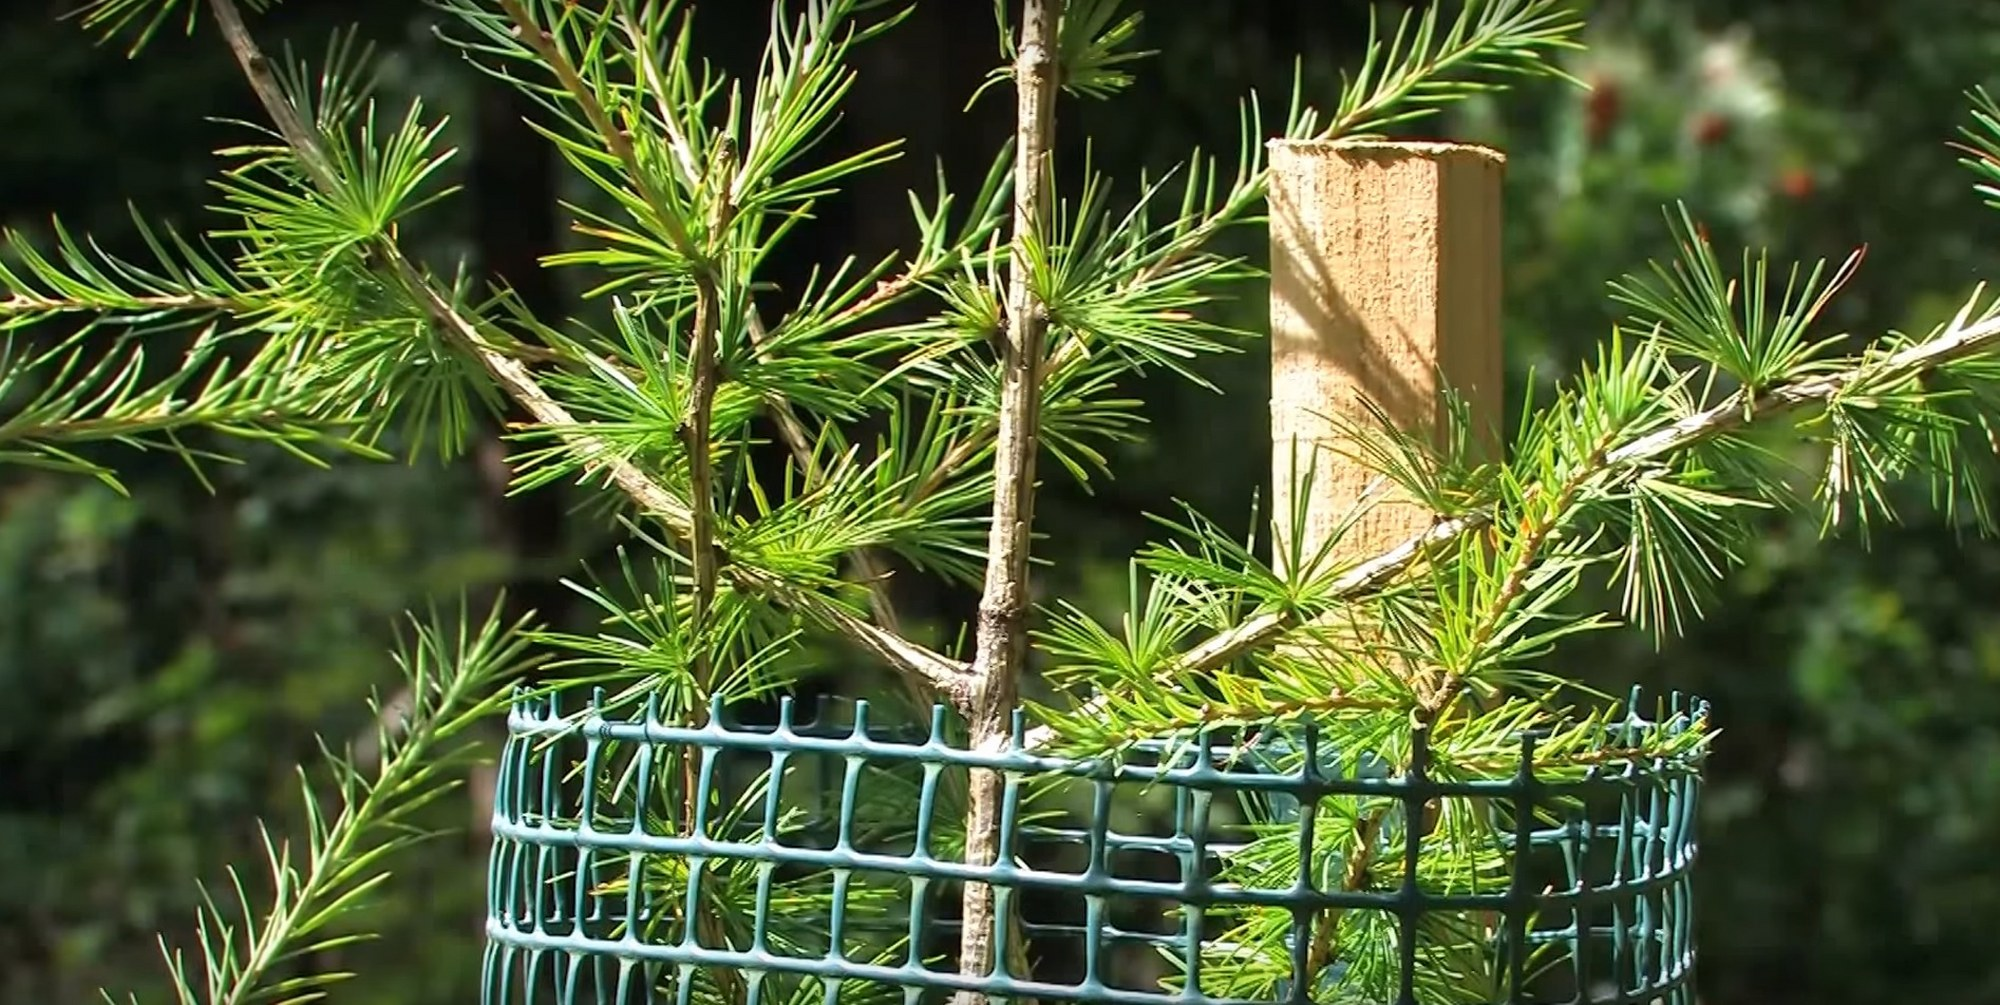 Protectie conifere Freiwuchs - larice (zada)